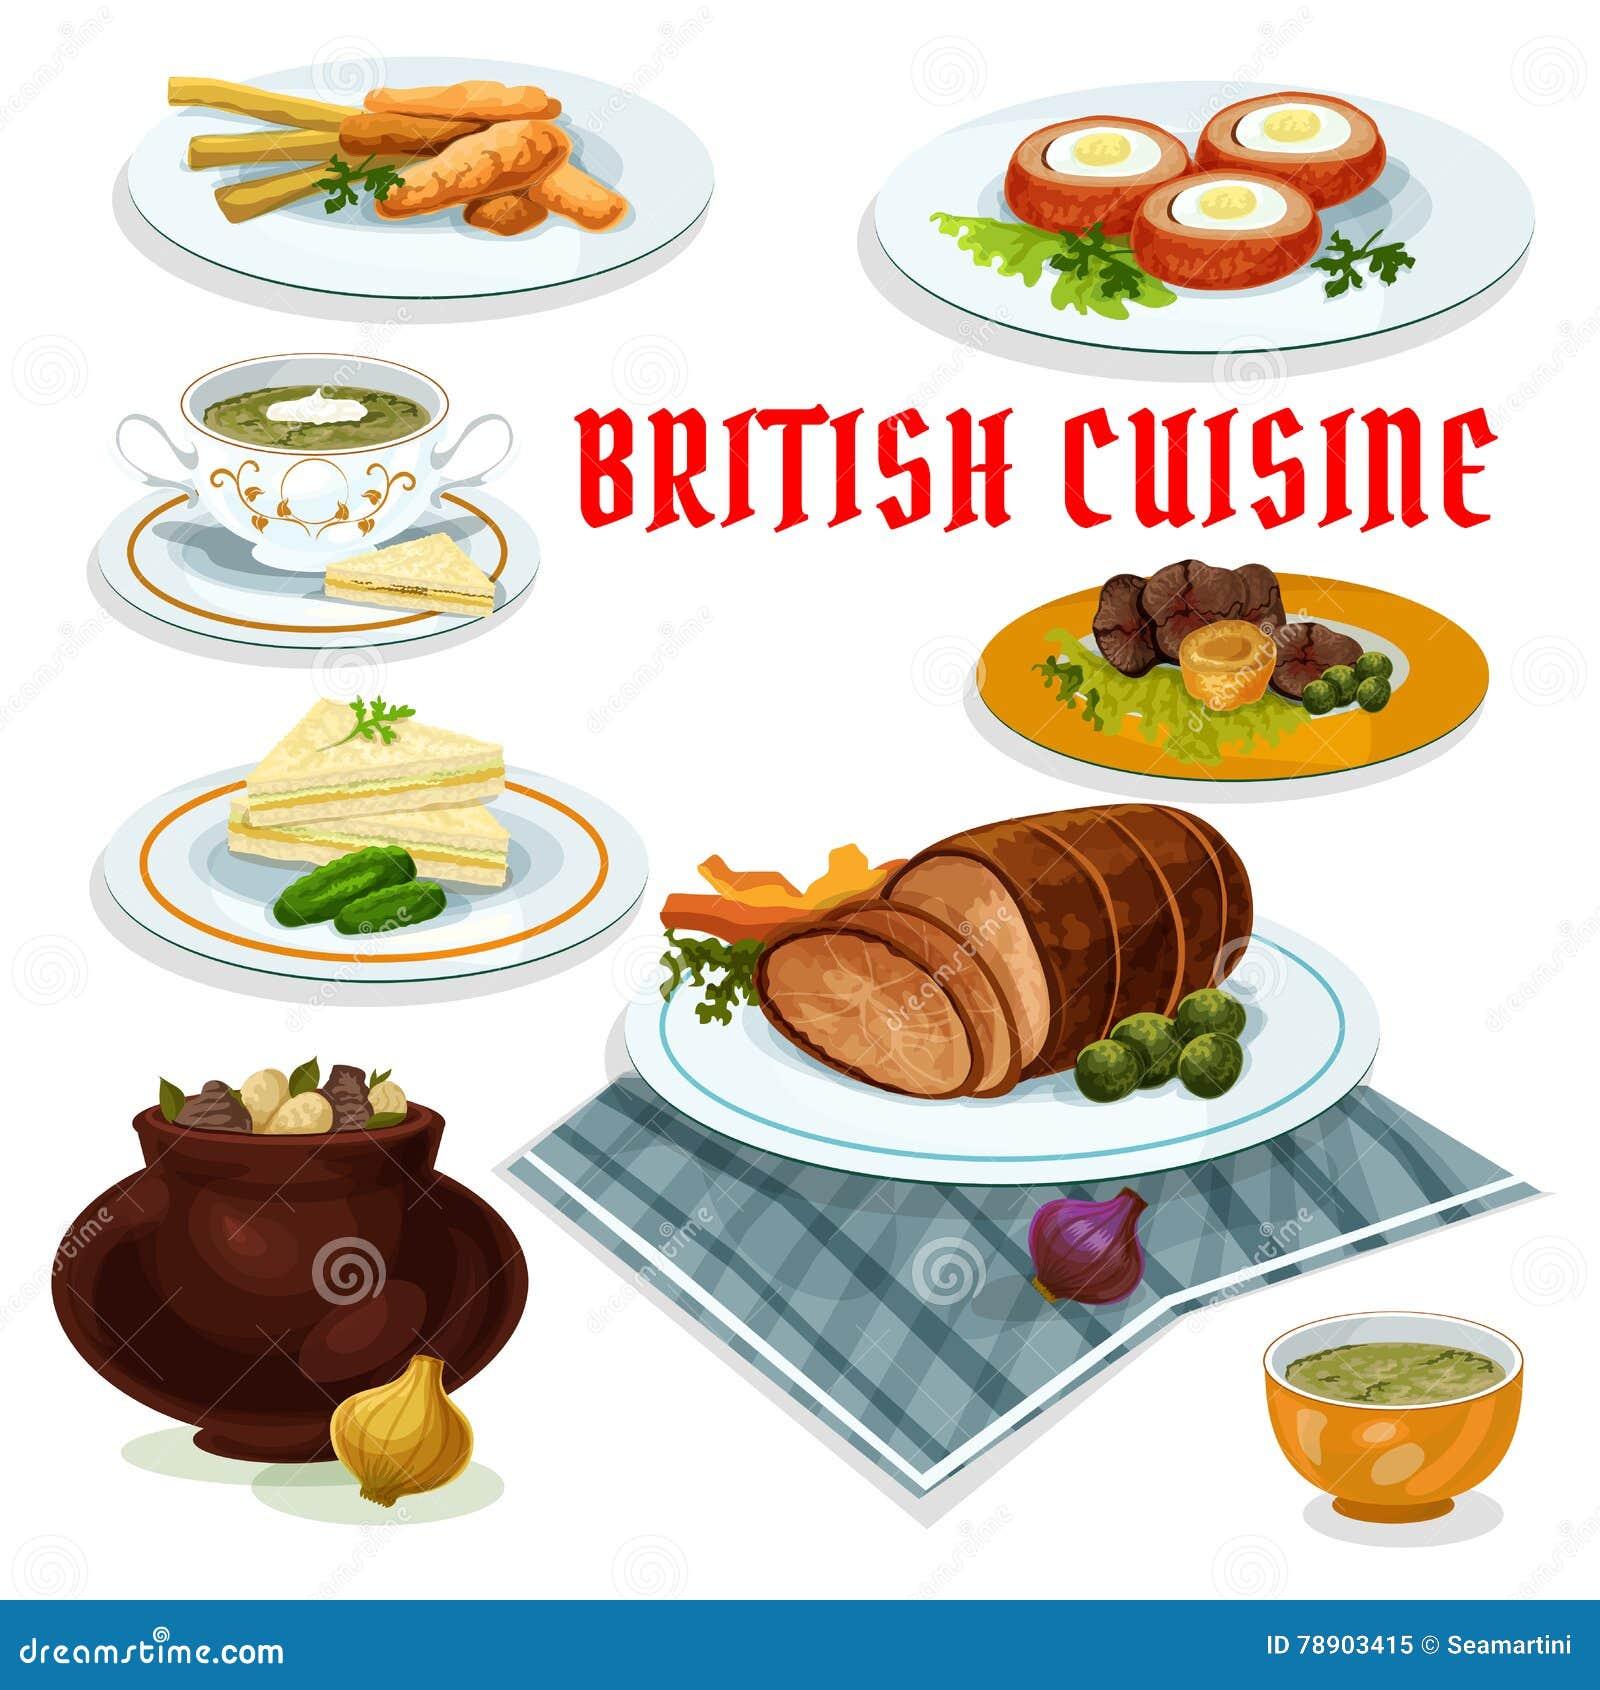 british cuisine dinner menu cartoon icon stock vector image 78903415. Black Bedroom Furniture Sets. Home Design Ideas